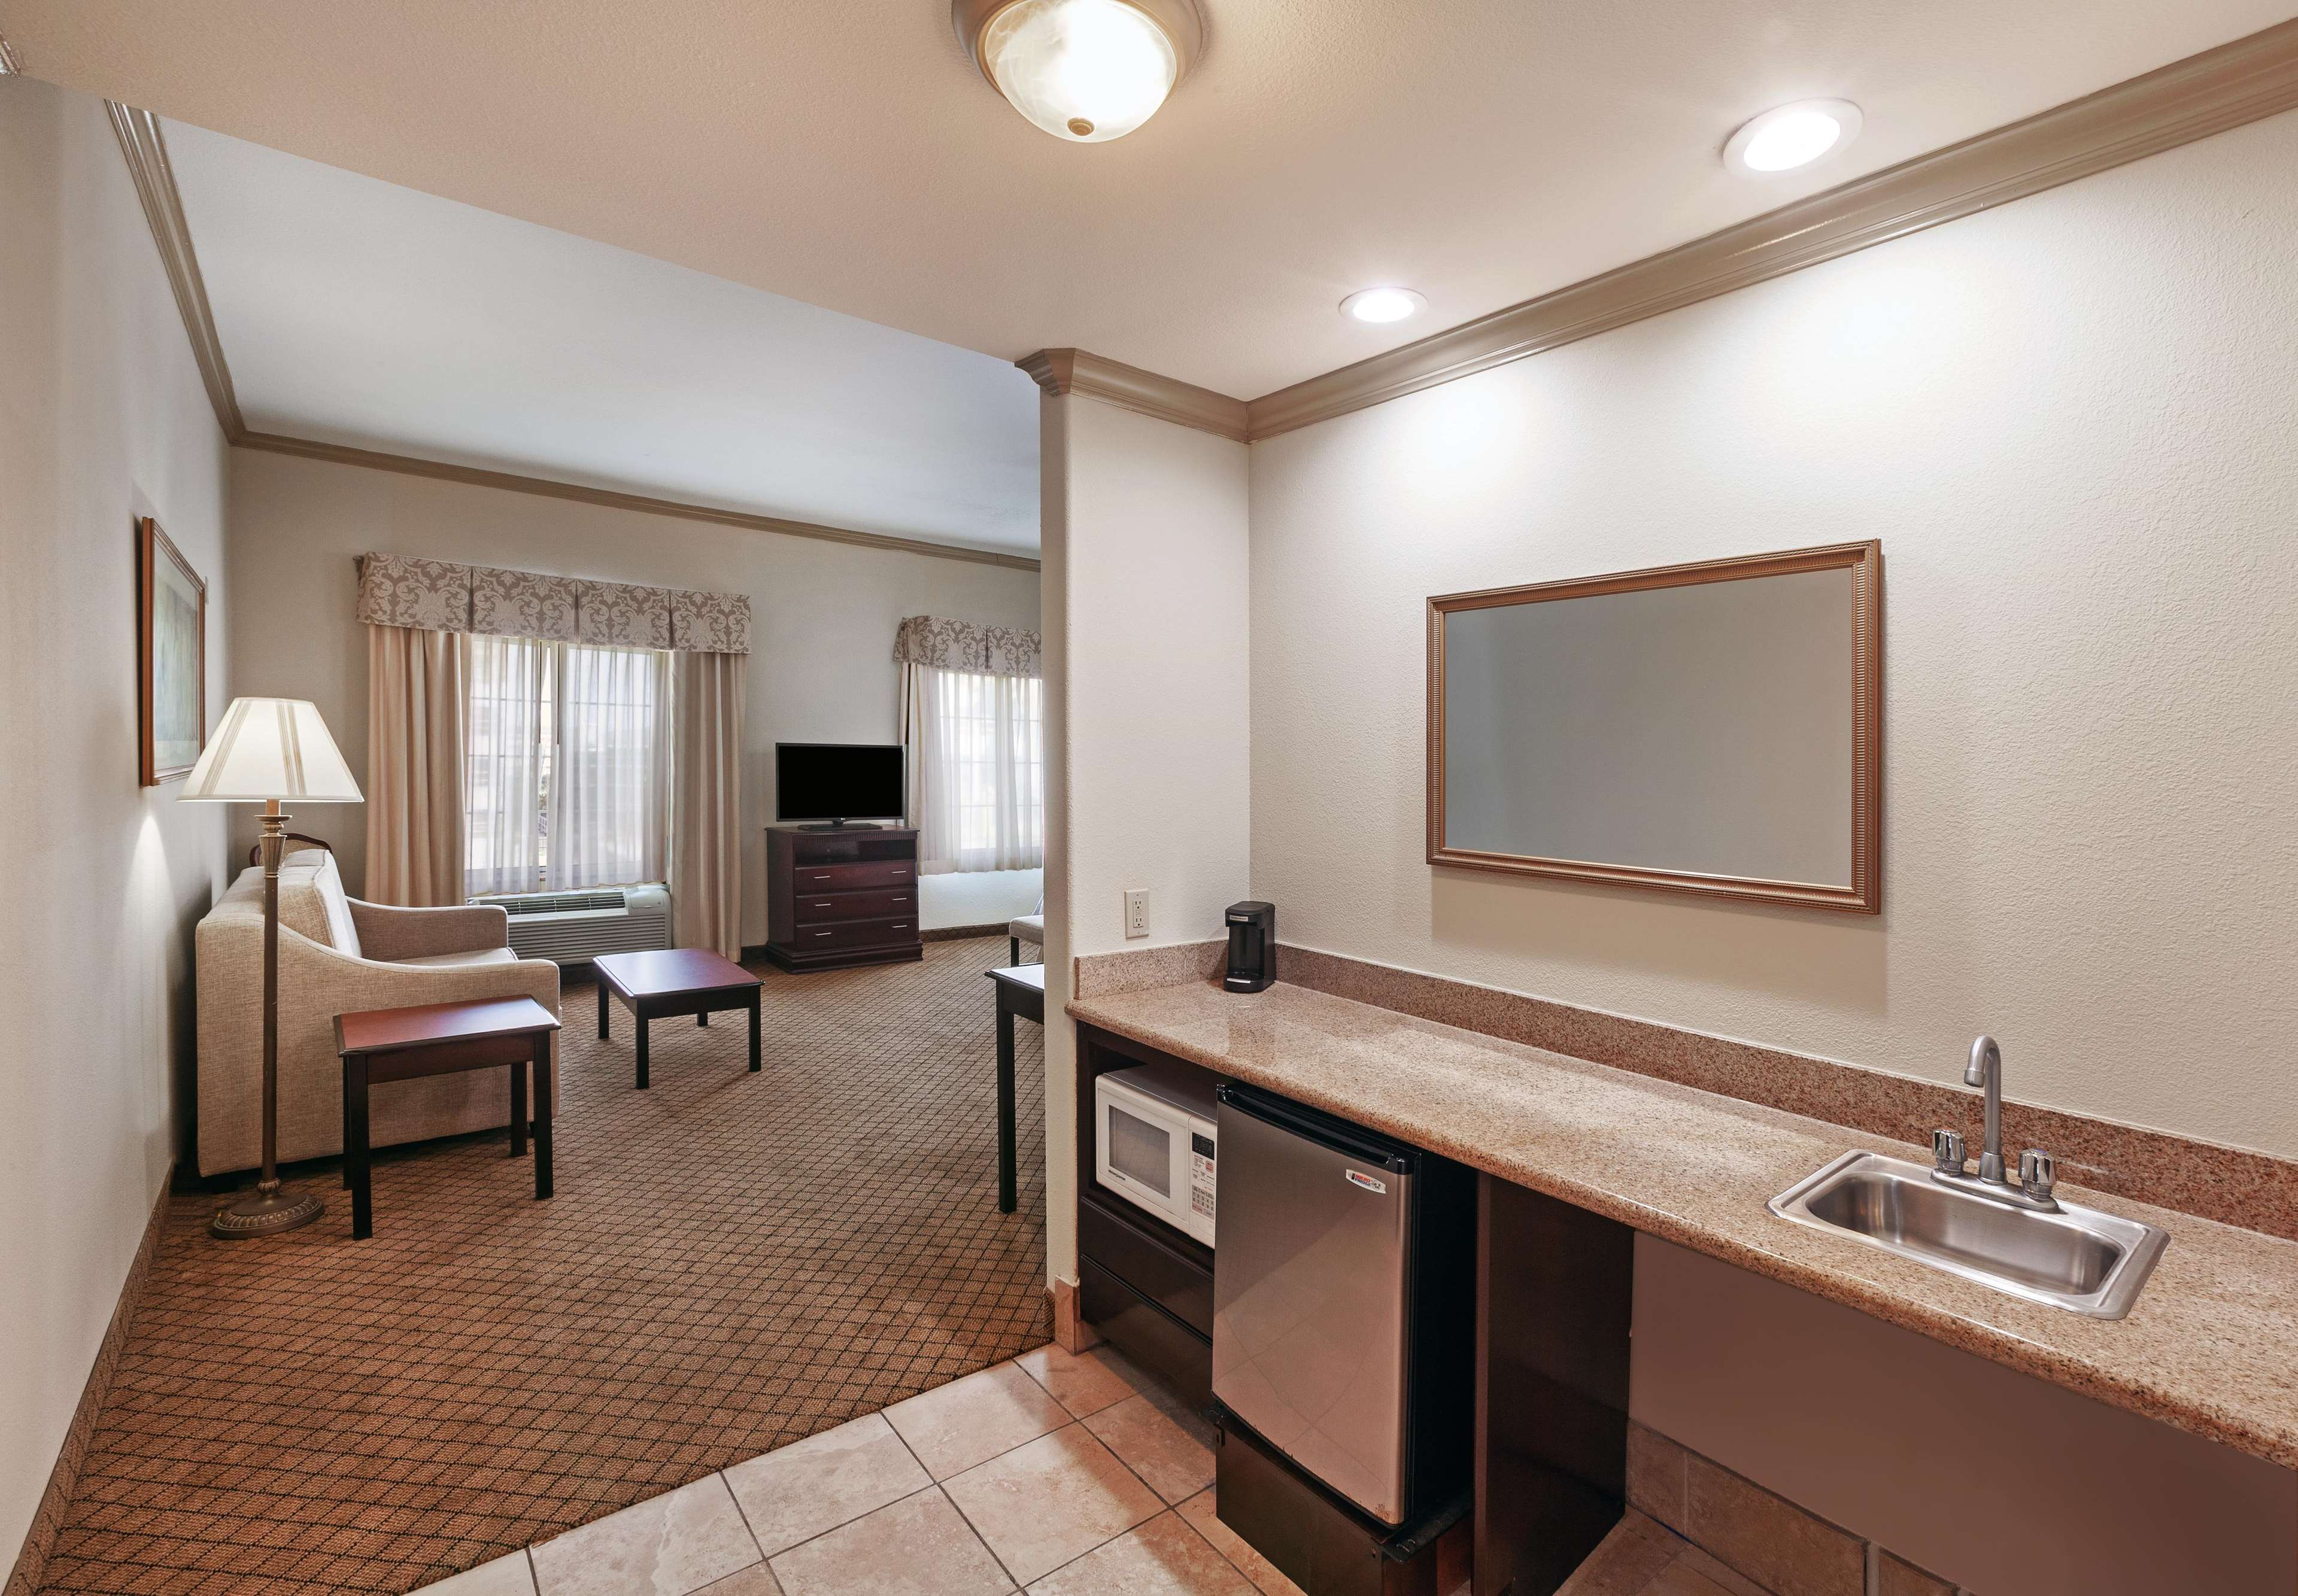 Hampton Inn & Suites Galveston image 24